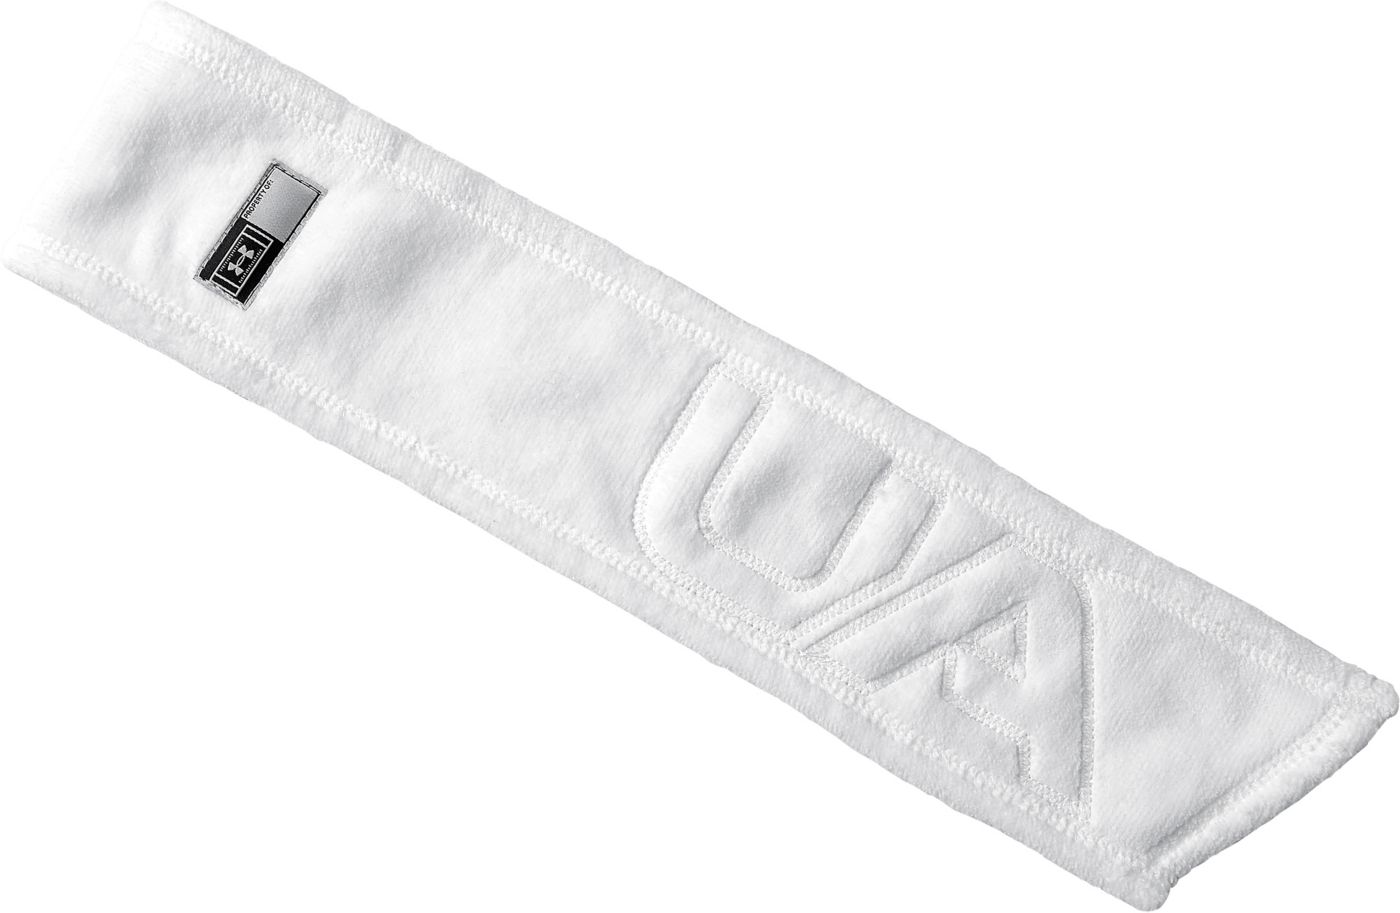 Under Armour Streamer Football Towel